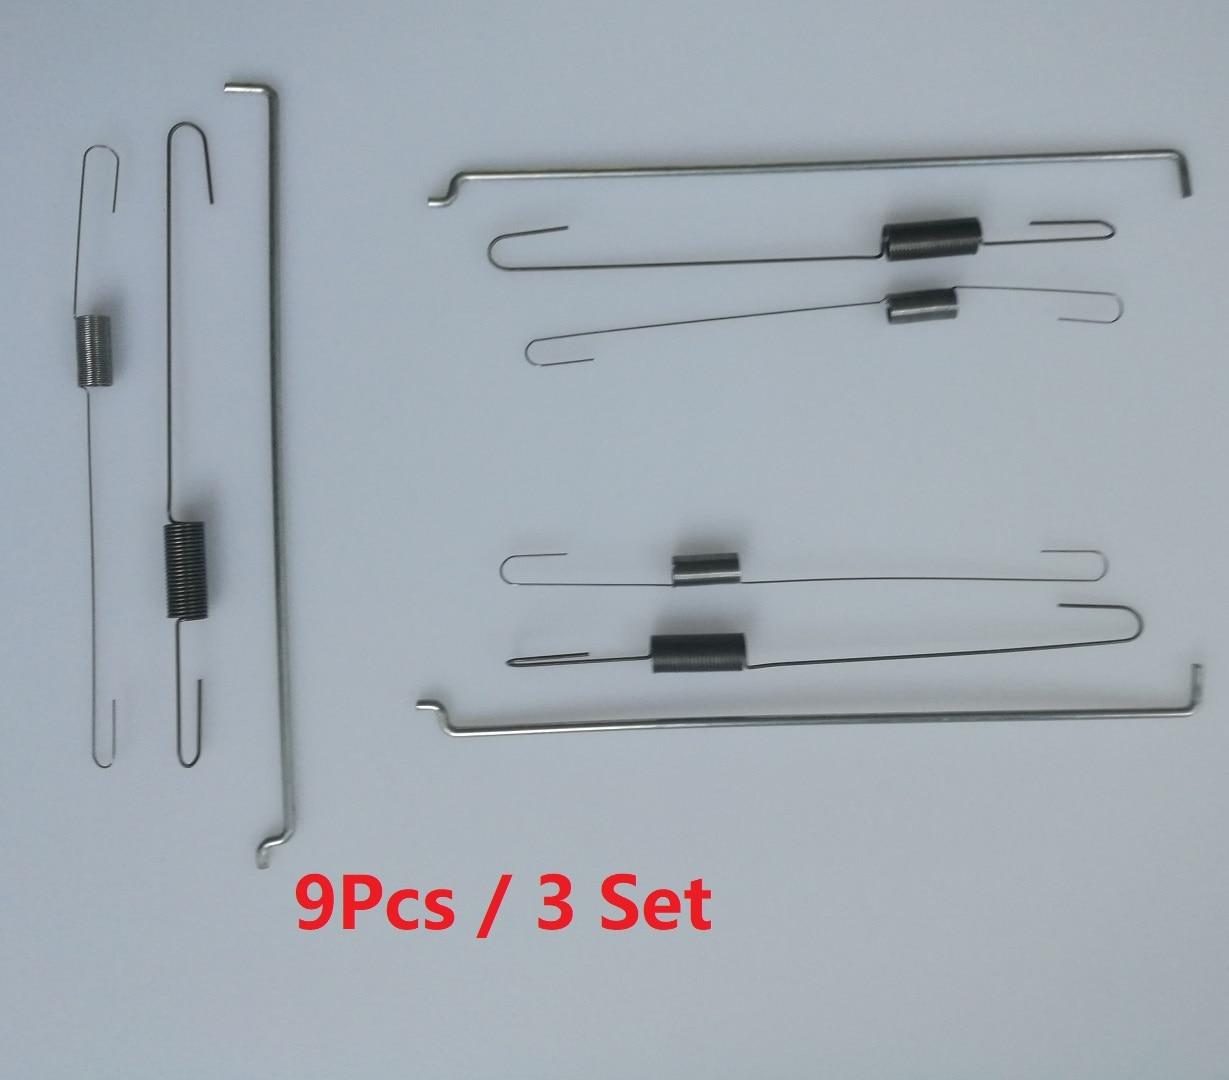 9pcs/3set New  Metal Throttle Return Spring Governor Link Rod Set 16555-ZE1-000 16561-ZE1-020 Fit For Honda GX140 GX160 GX200